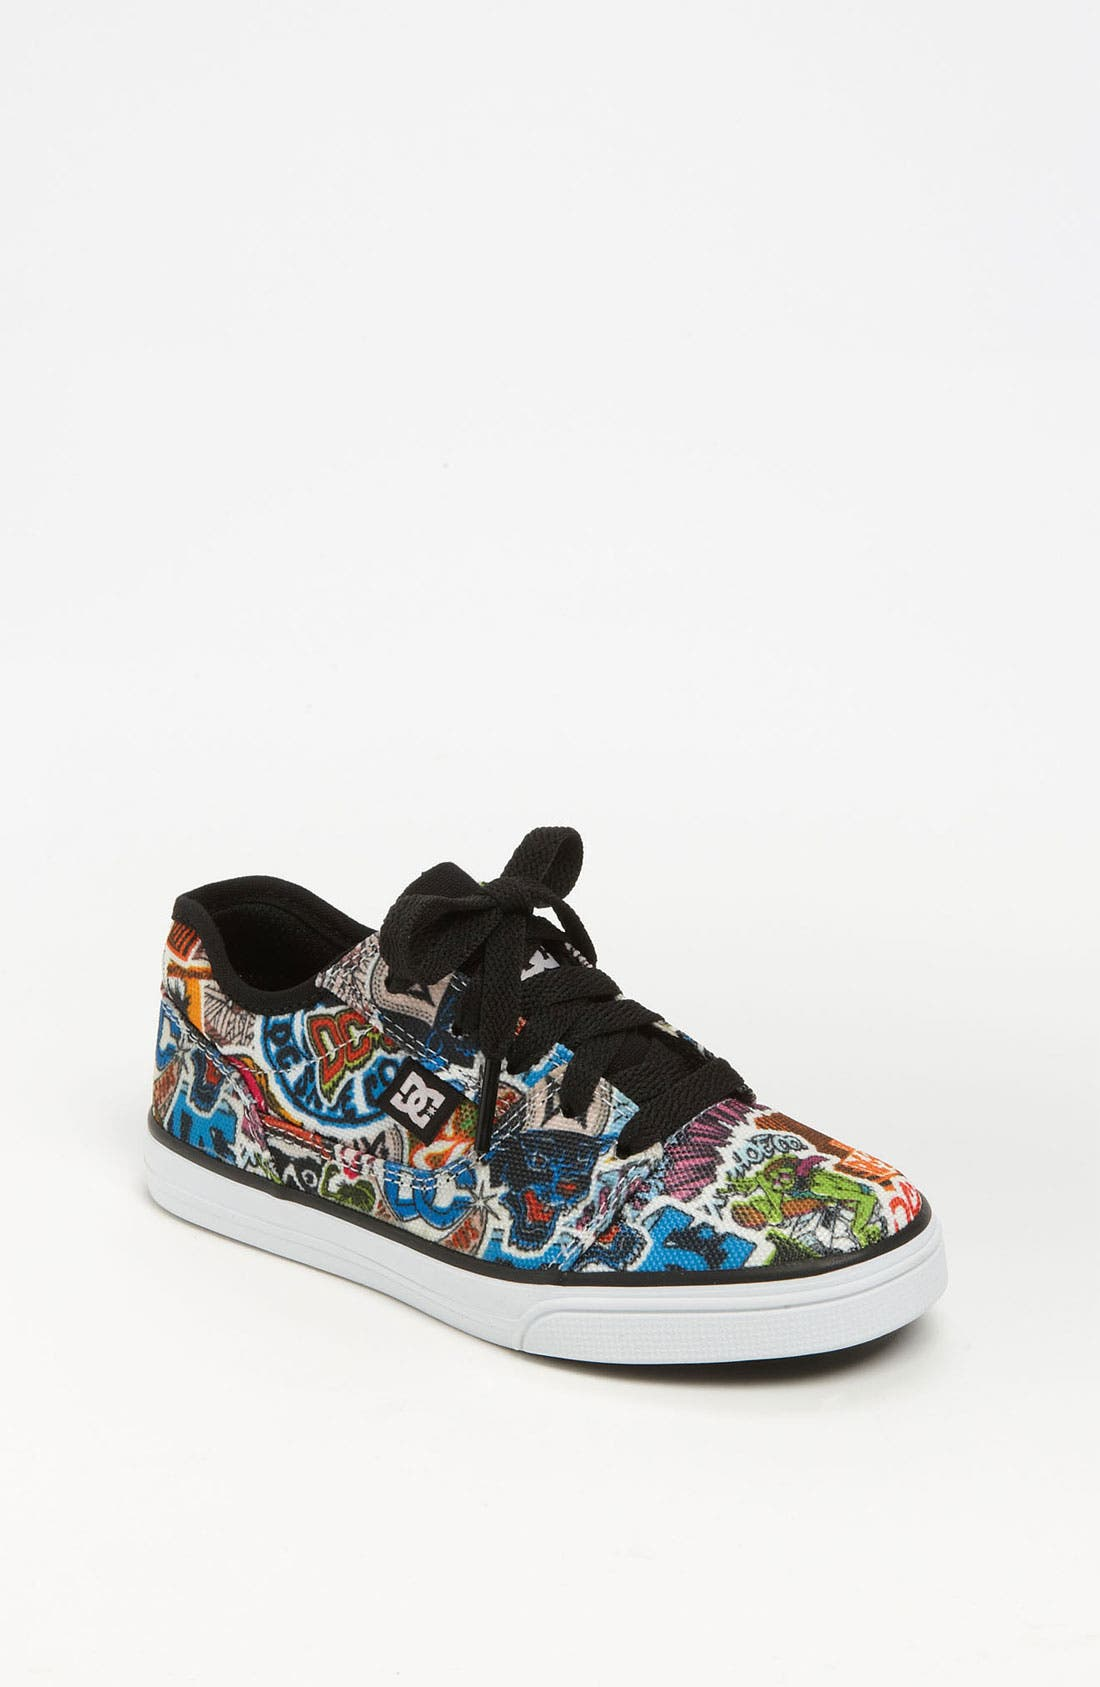 Alternate Image 1 Selected - DC Shoes 'Bristol' Sneaker (Toddler, Little Kid & Big Kid)